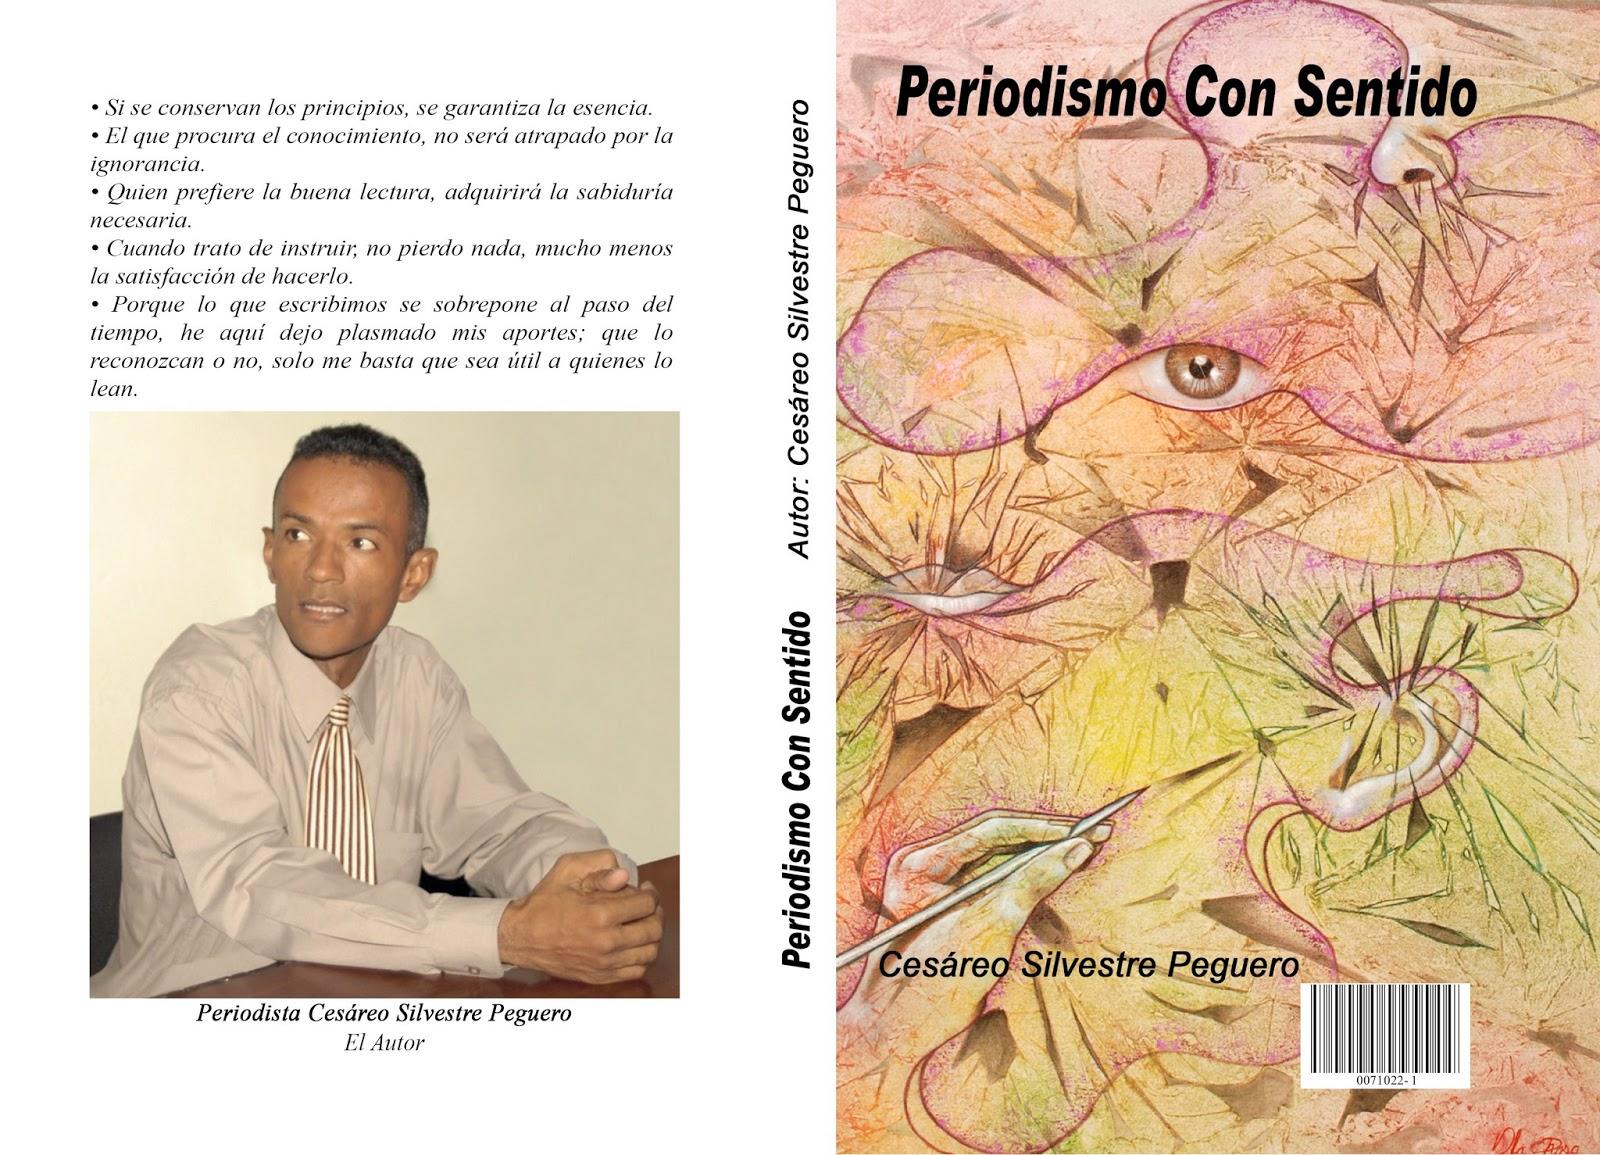 PORTADA Y CONTRA PORTADA LIBRO PERIODISMO CON SENTIDO, AUTOR CESÁREO SILVESTRE PEGUERO.